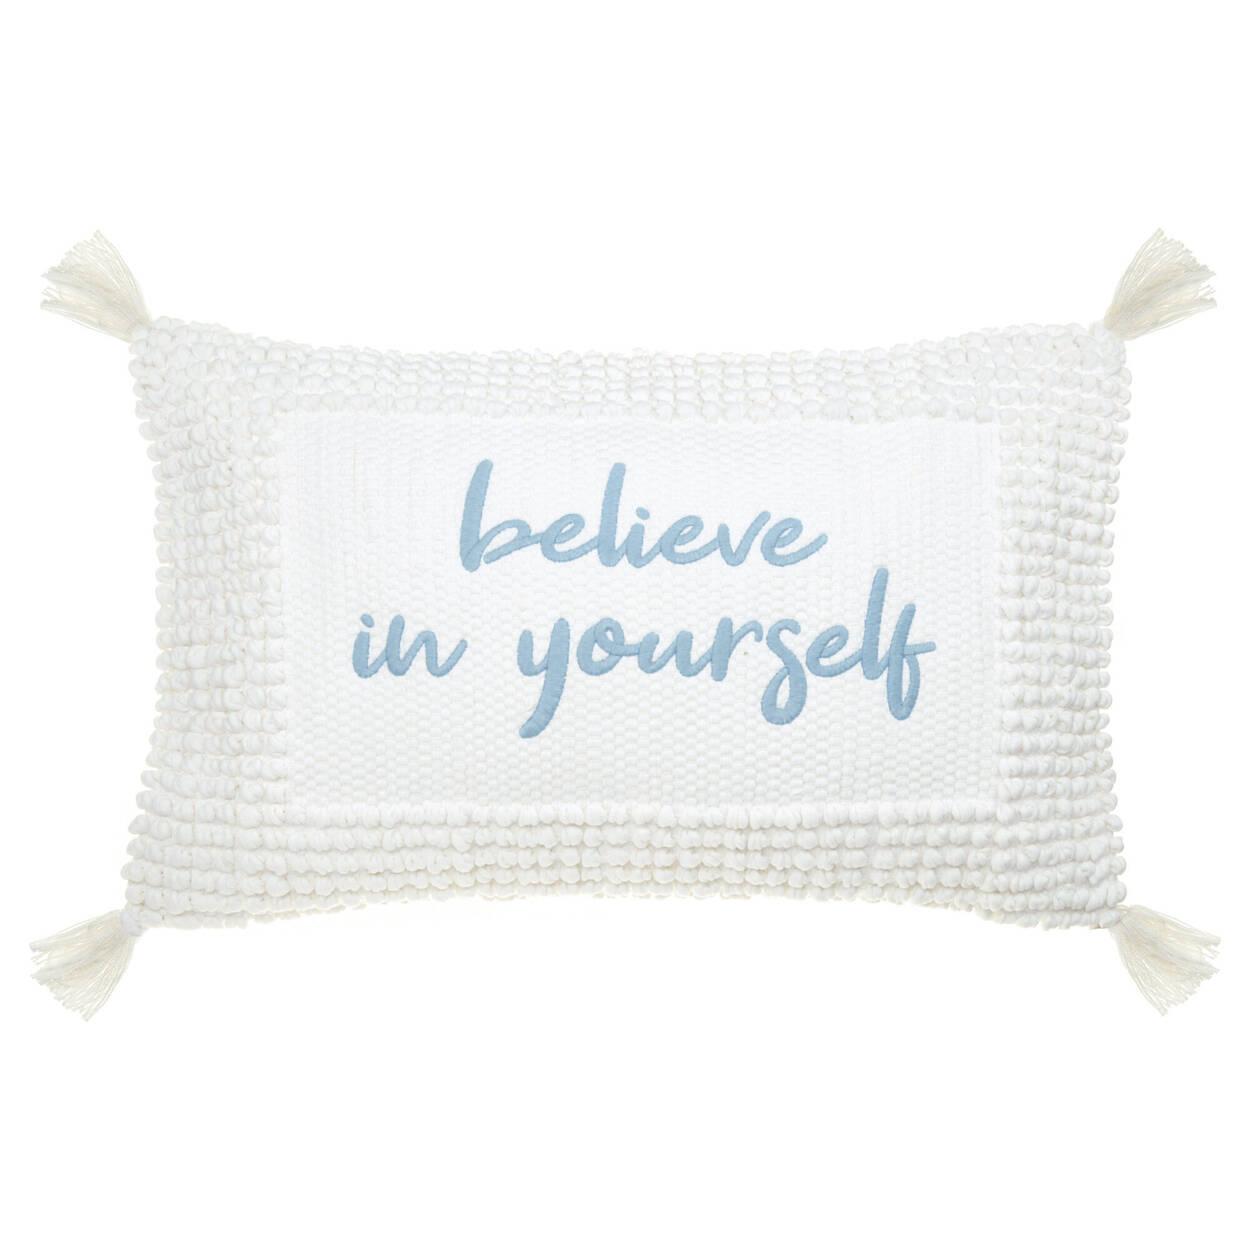 "Coussin lombaire décoratif Jenessa anglais Believe in Yourself 13"" x 20"""